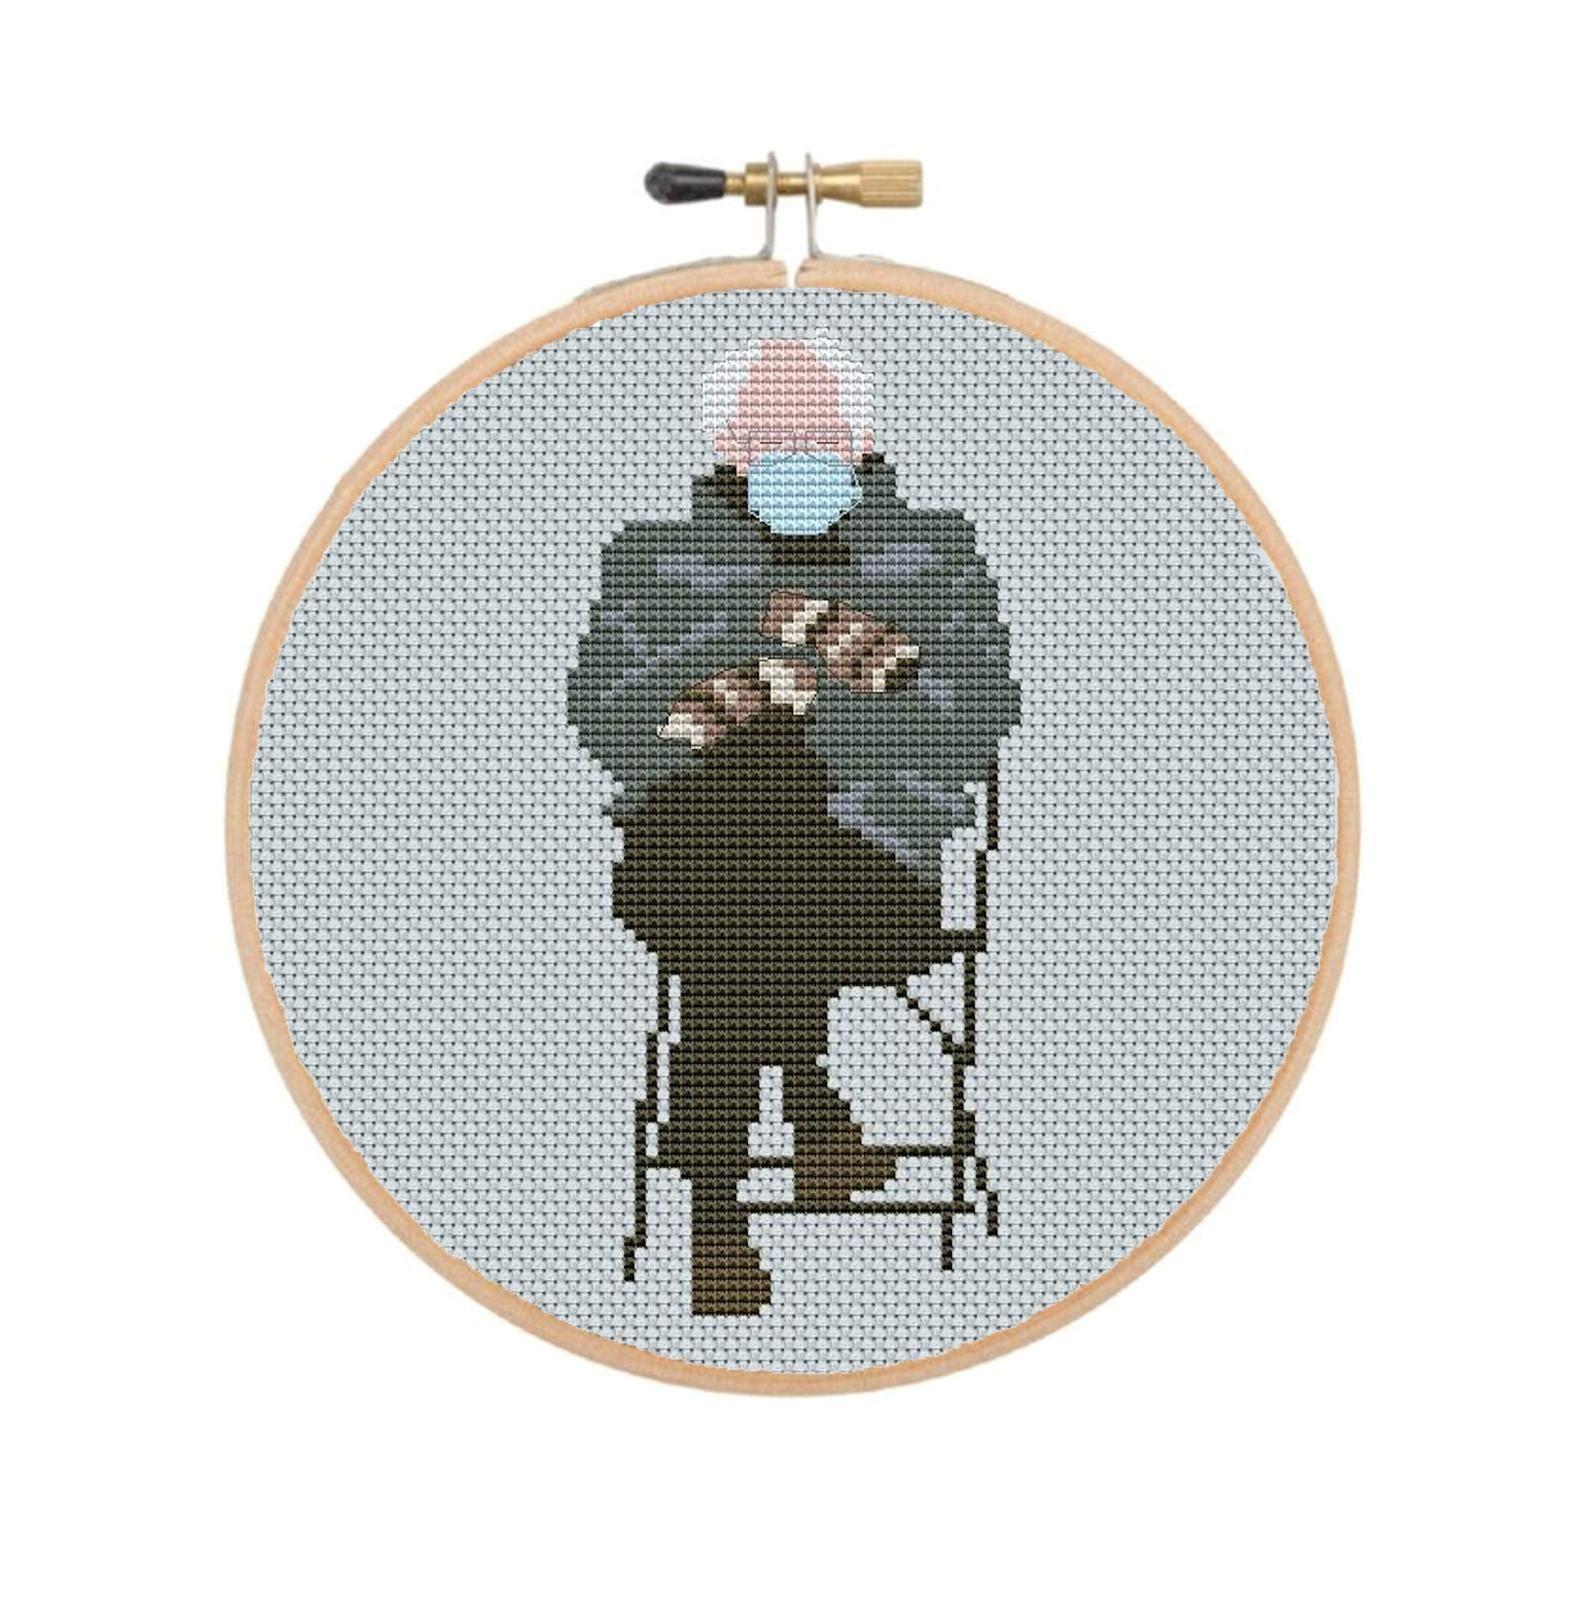 Inauguration Bernie Cross Stitch Pattern Bernie Sanders Etsy In 2021 Funny Cross Stitch Patterns Cross Stitch Patterns Stitch Patterns